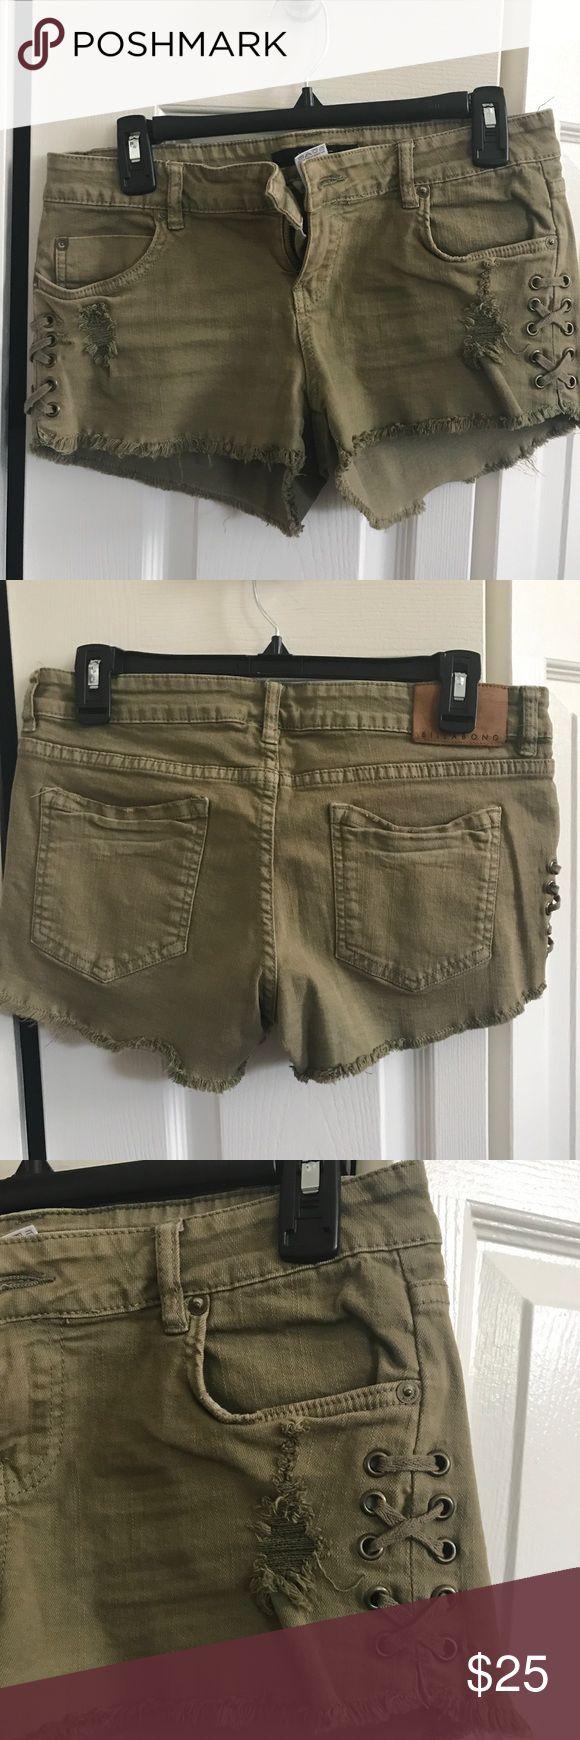 Distressed army green denim shorts Distressed army green denim shorts Billabong Shorts